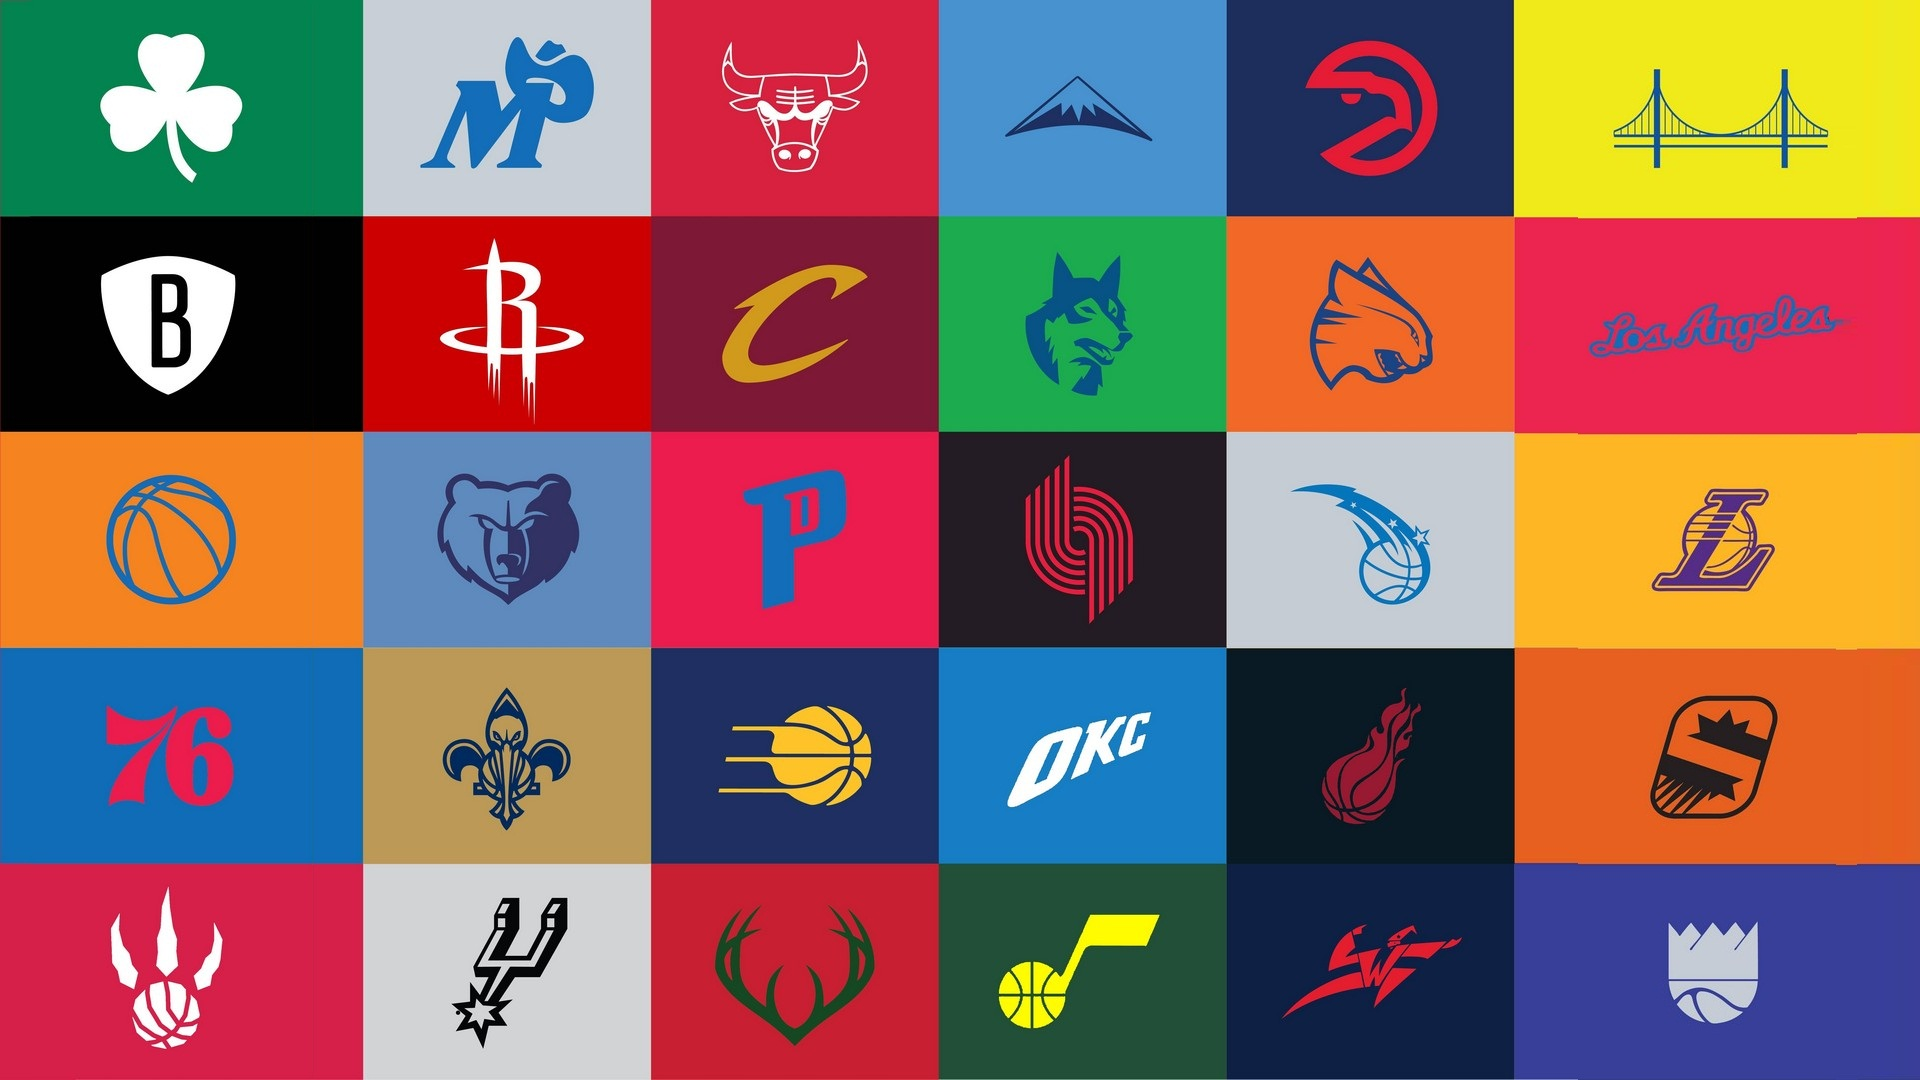 NBA For PC Wallpaper 2020 Basketball Wallpaper 1920x1080